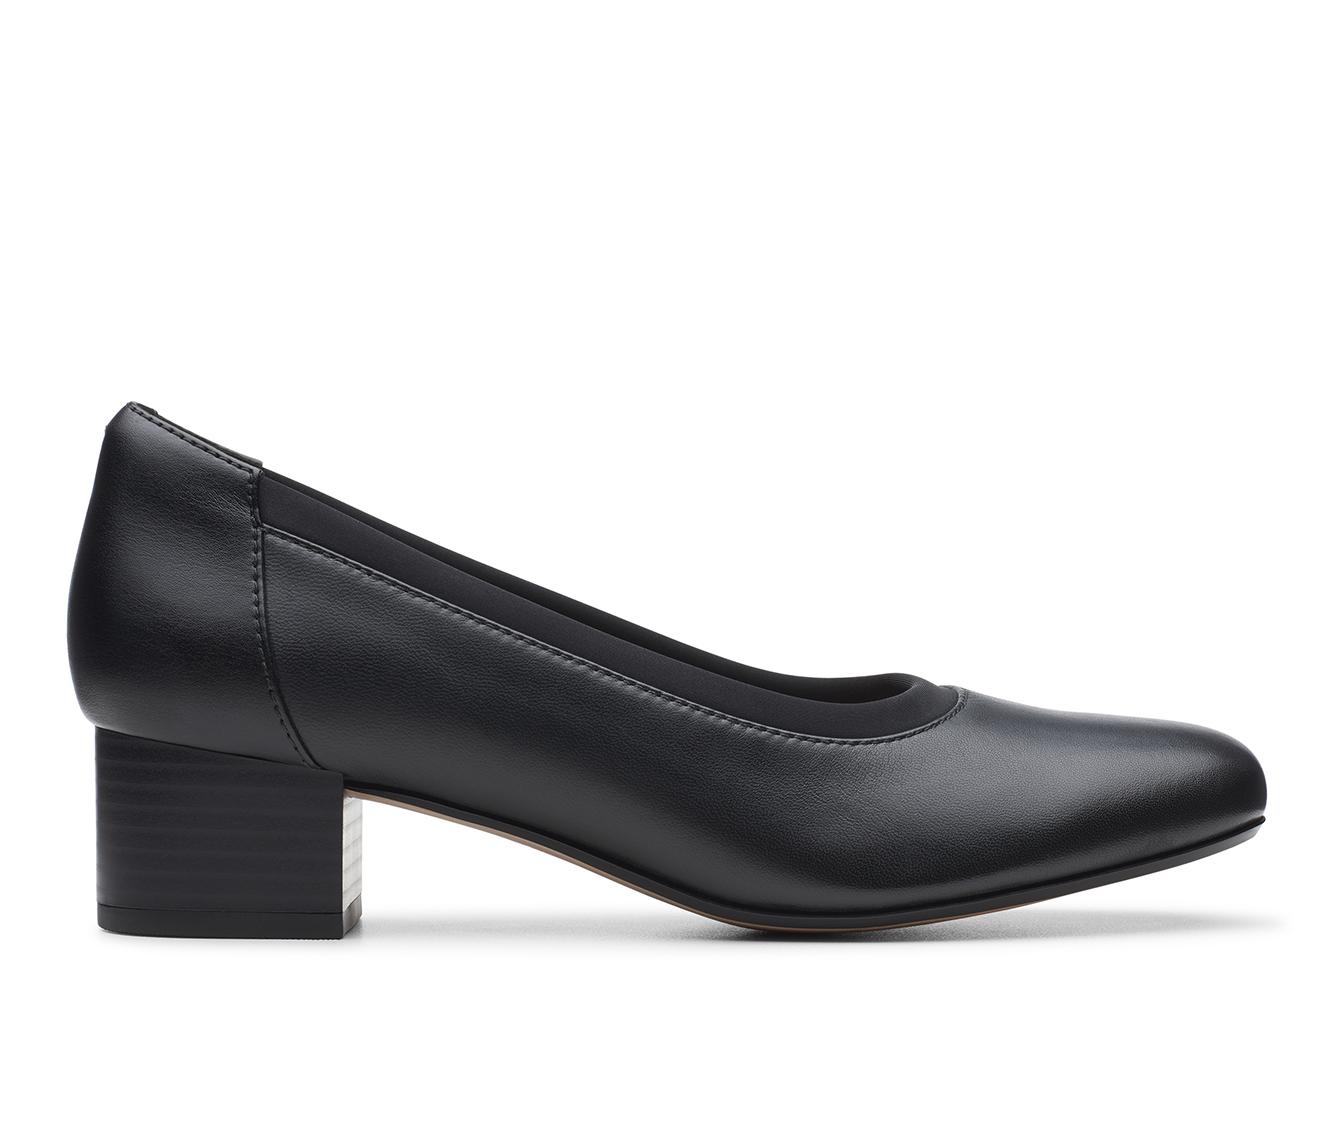 Clarks Chartli Fame Women's Dress Shoe (Black Leather)